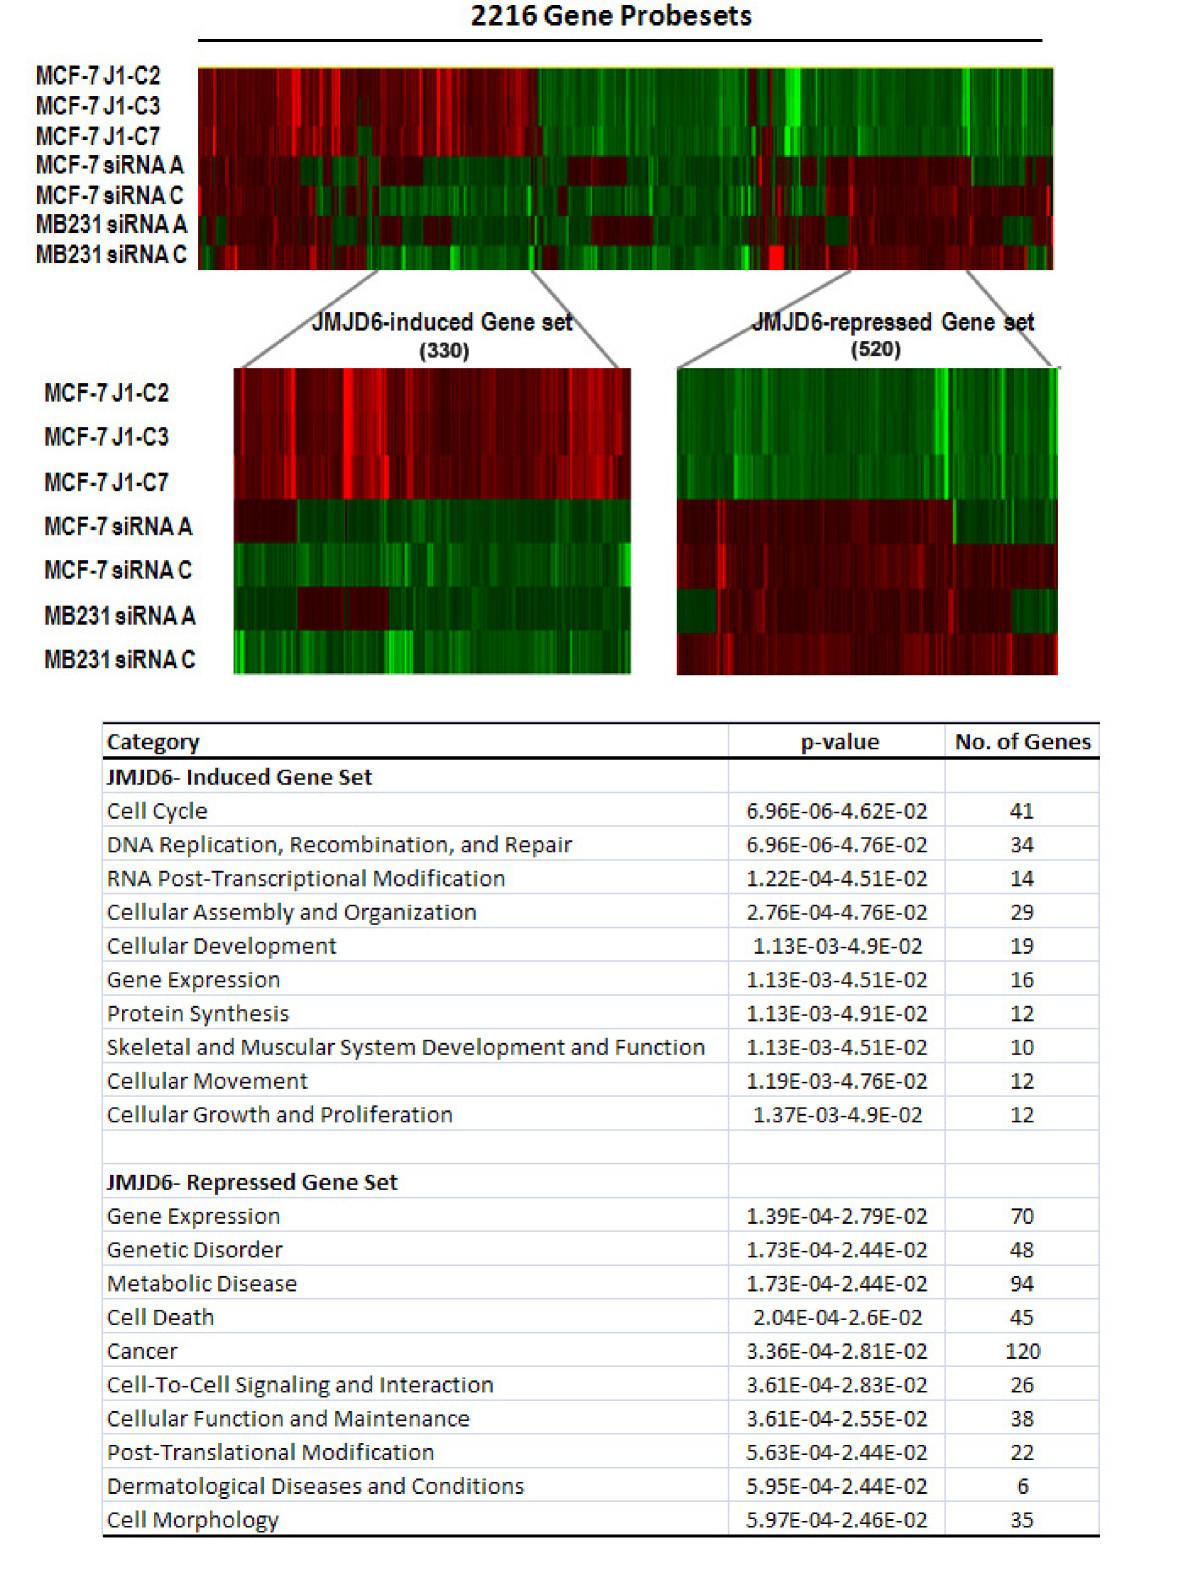 https://static-content.springer.com/image/art%3A10.1186%2Fbcr3200/MediaObjects/13058_2011_Article_3001_Fig6_HTML.jpg